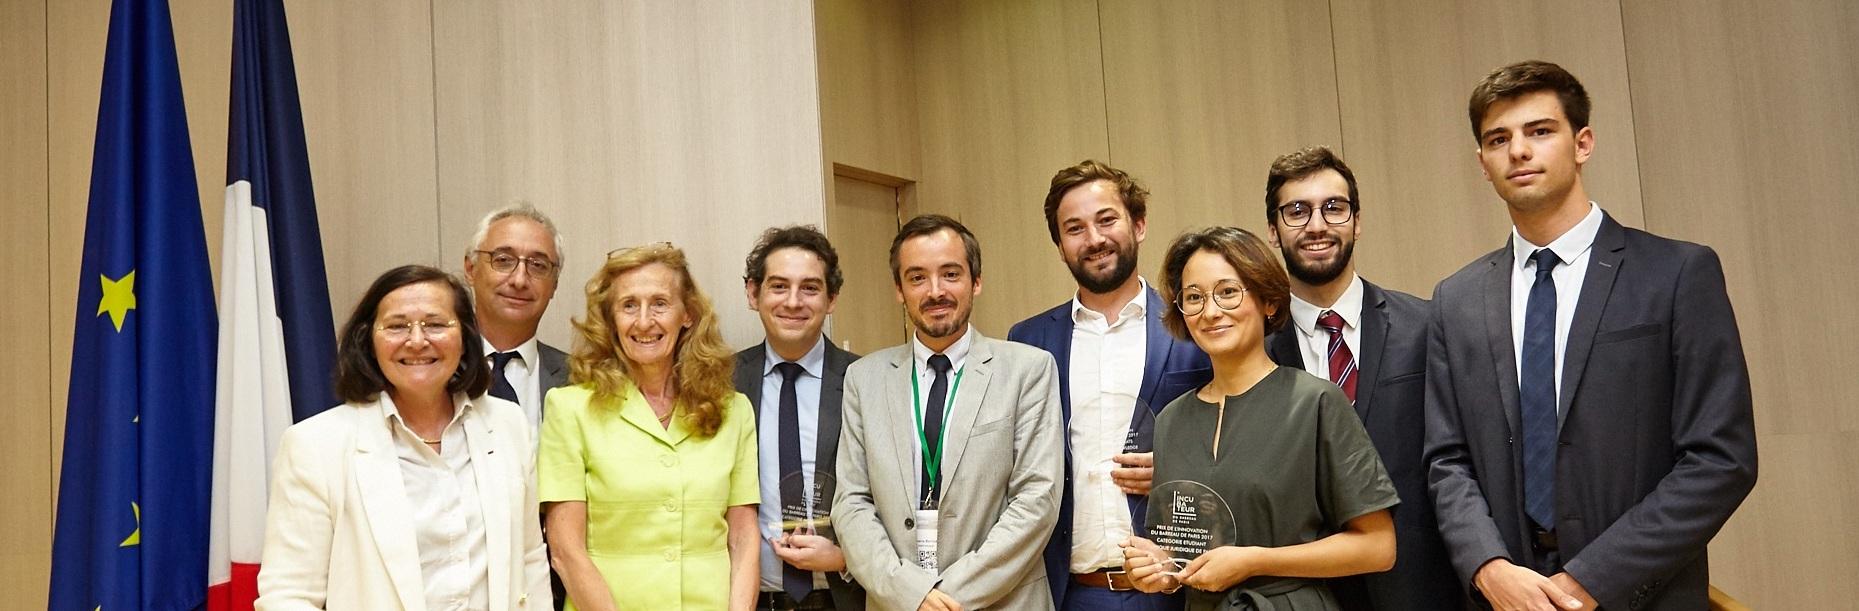 lauréats prix de l'innovation 2017 - IBP 2017